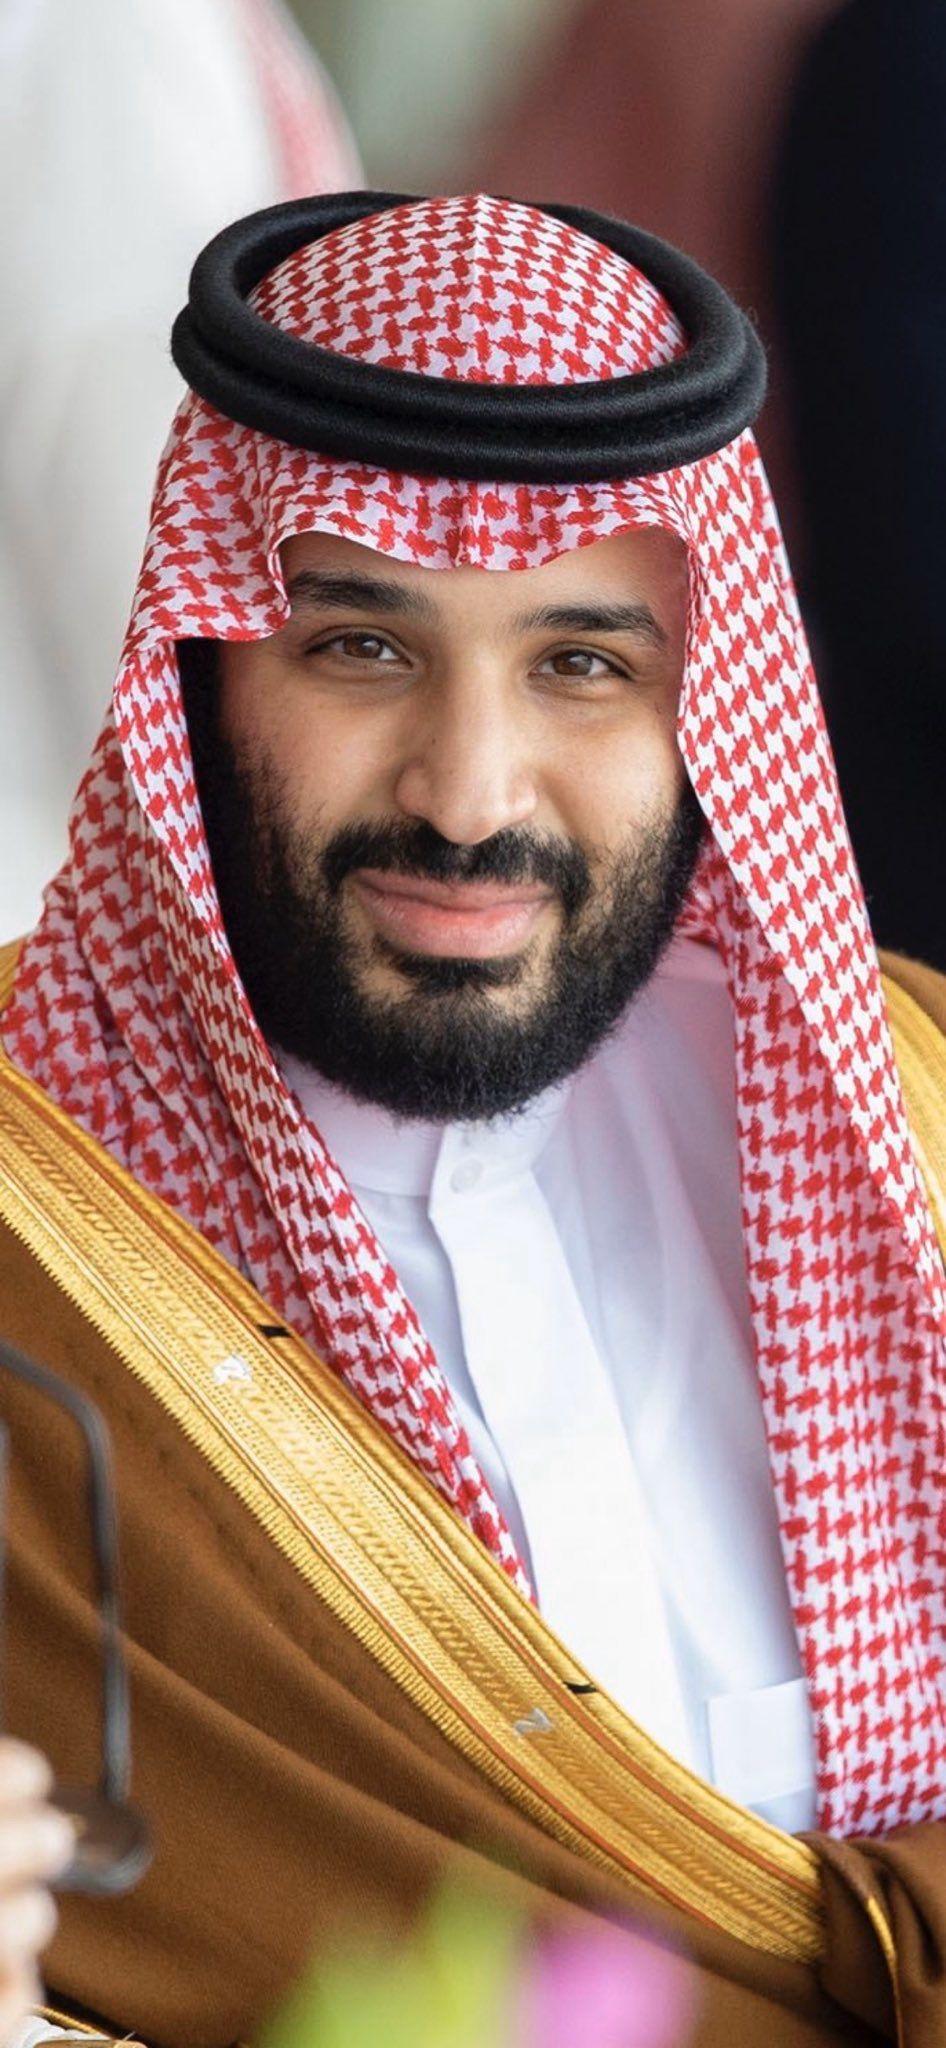 الله يحفظك بحفظه National Day Saudi Prince Mohammed Whatsapp Background